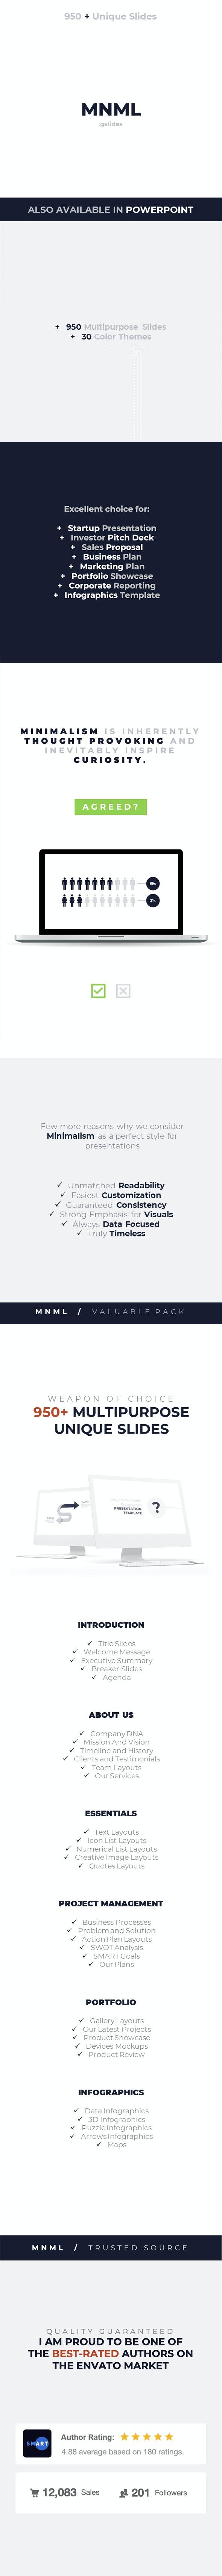 MNML - Google Slides Presentation Template